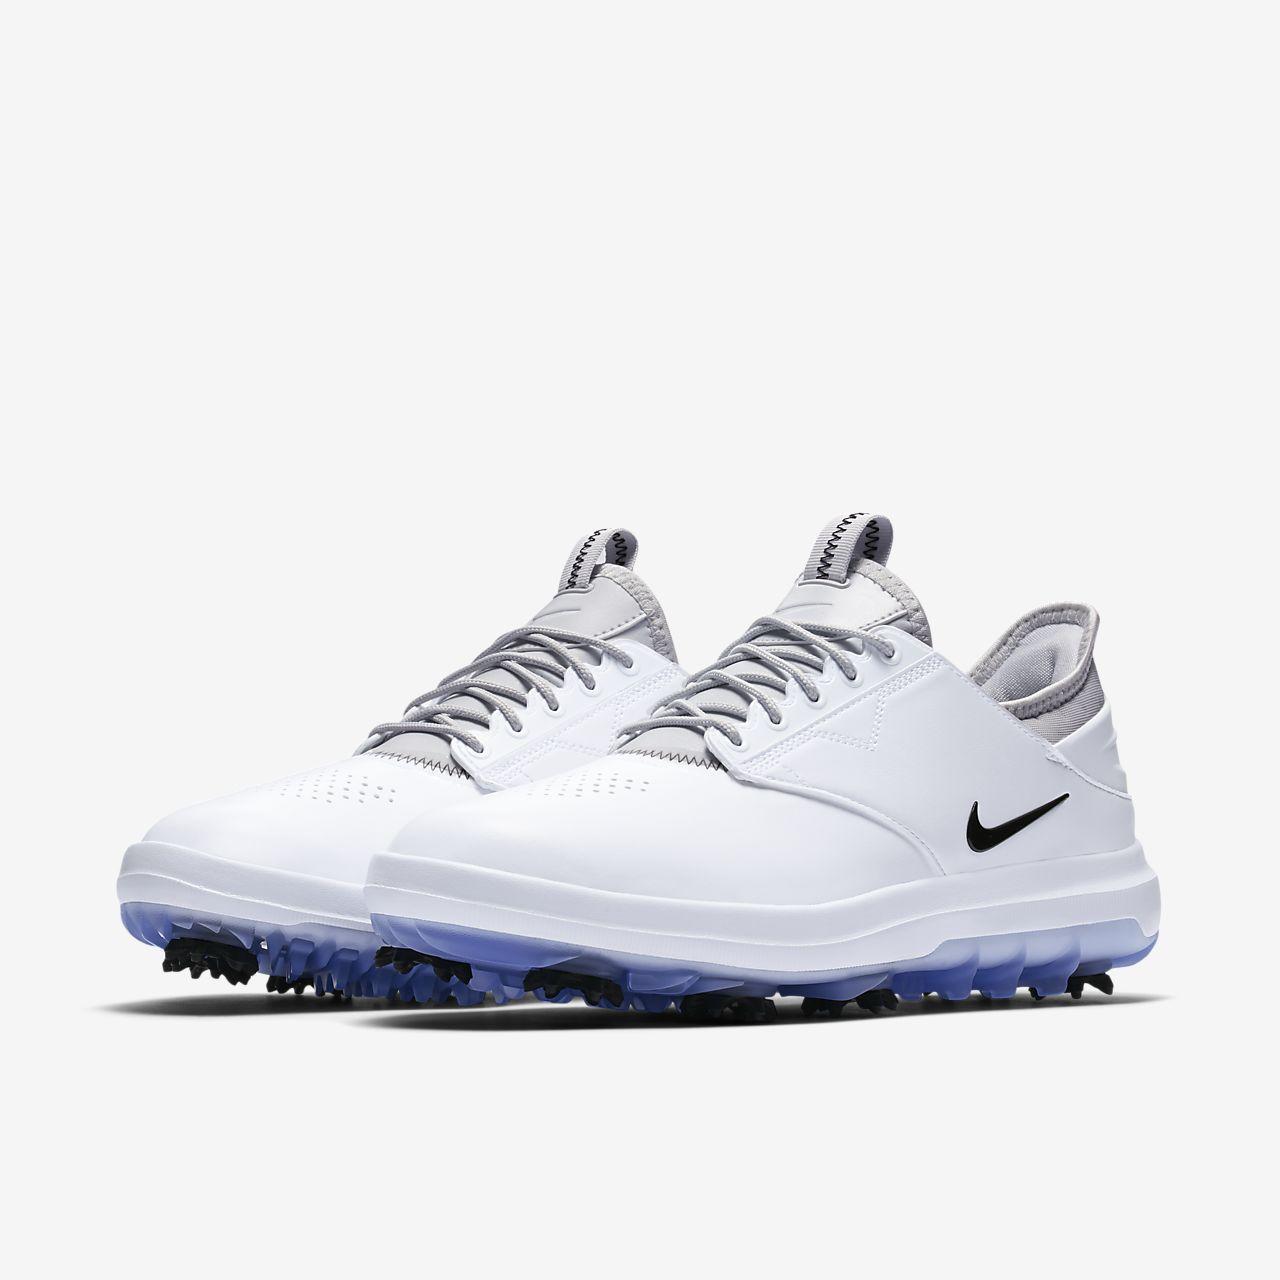 cc3d81425d175 Nike Air Zoom Direct Men s Golf Shoe. Nike.com CA